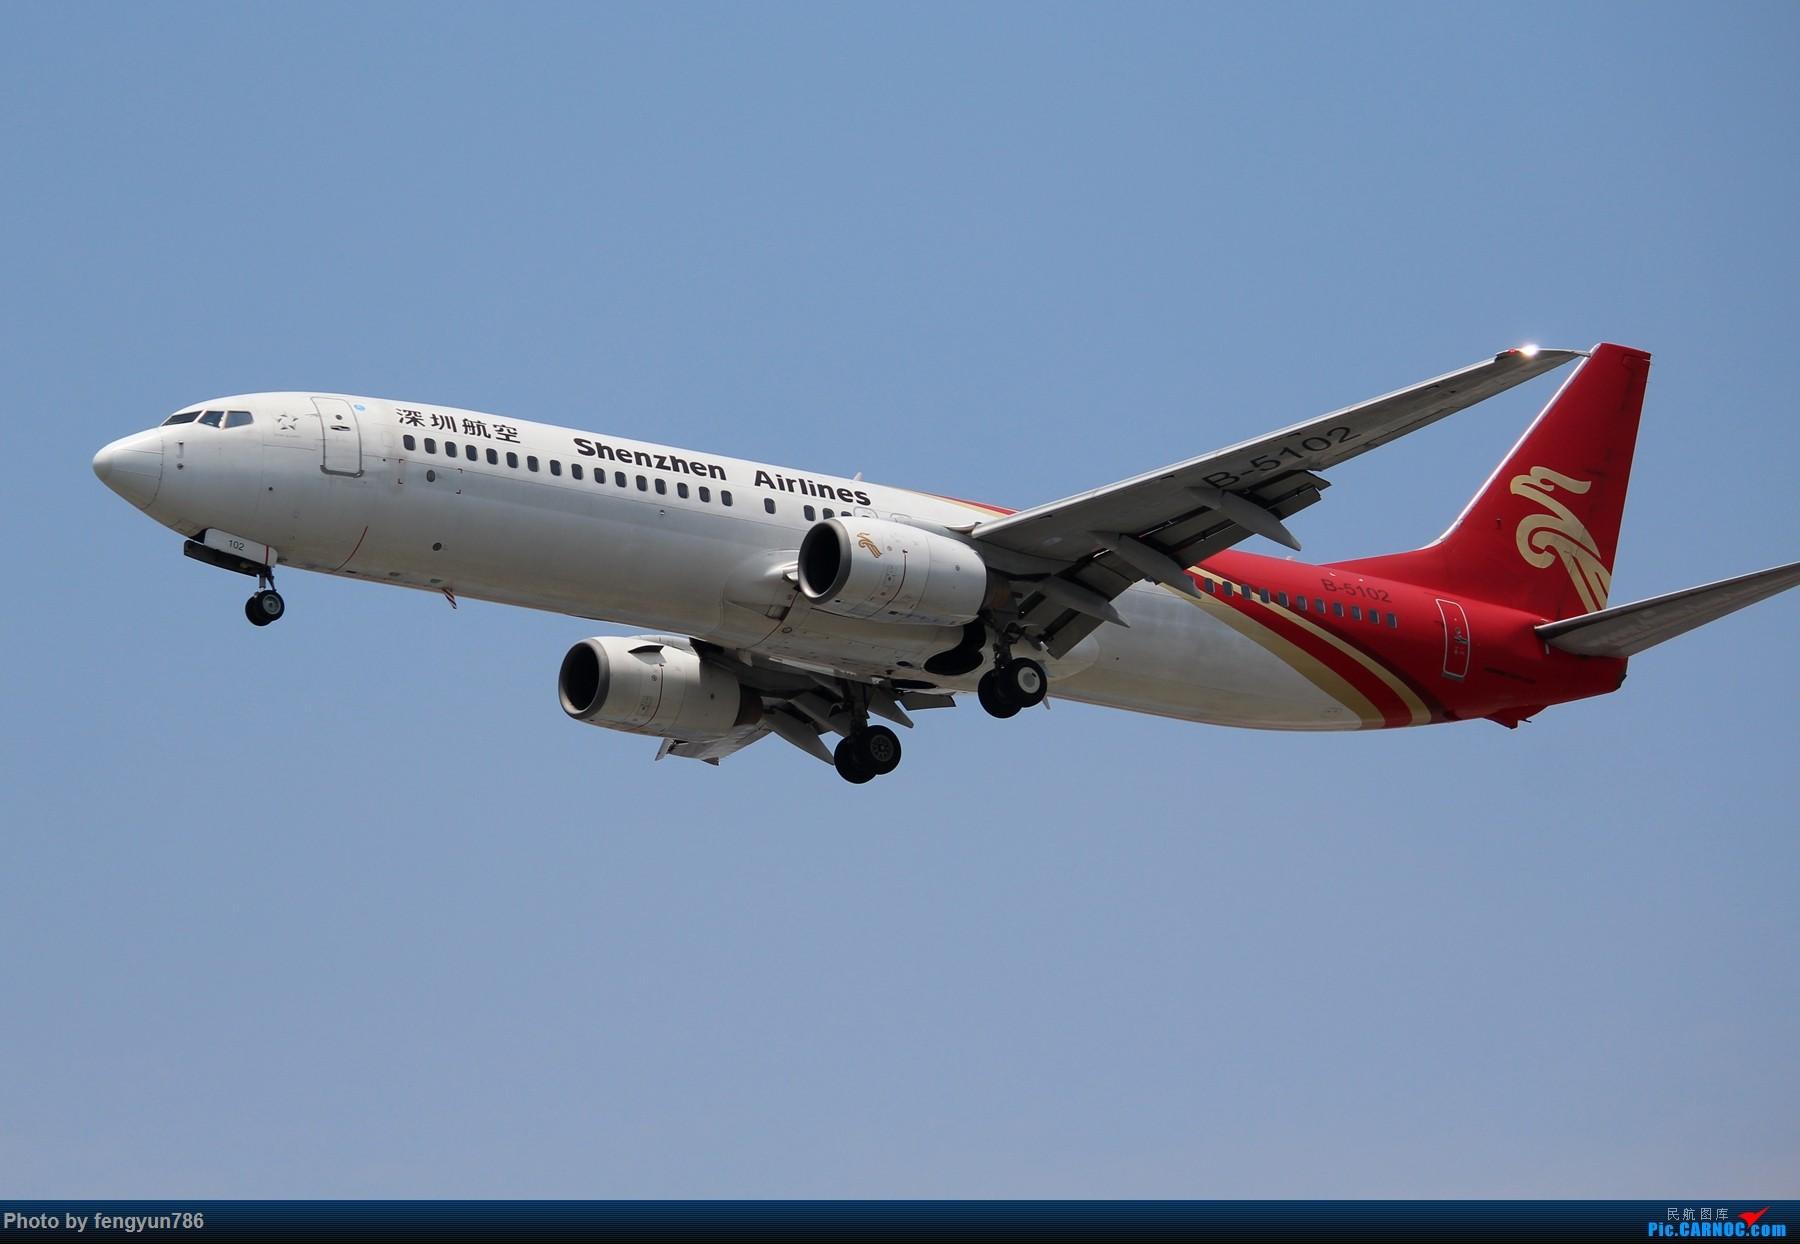 Re:[原创]7.19的SHA,天晴温高,发几个跟前一天不一样的。 BOEING 737-900 B-5102 中国上海虹桥国际机场